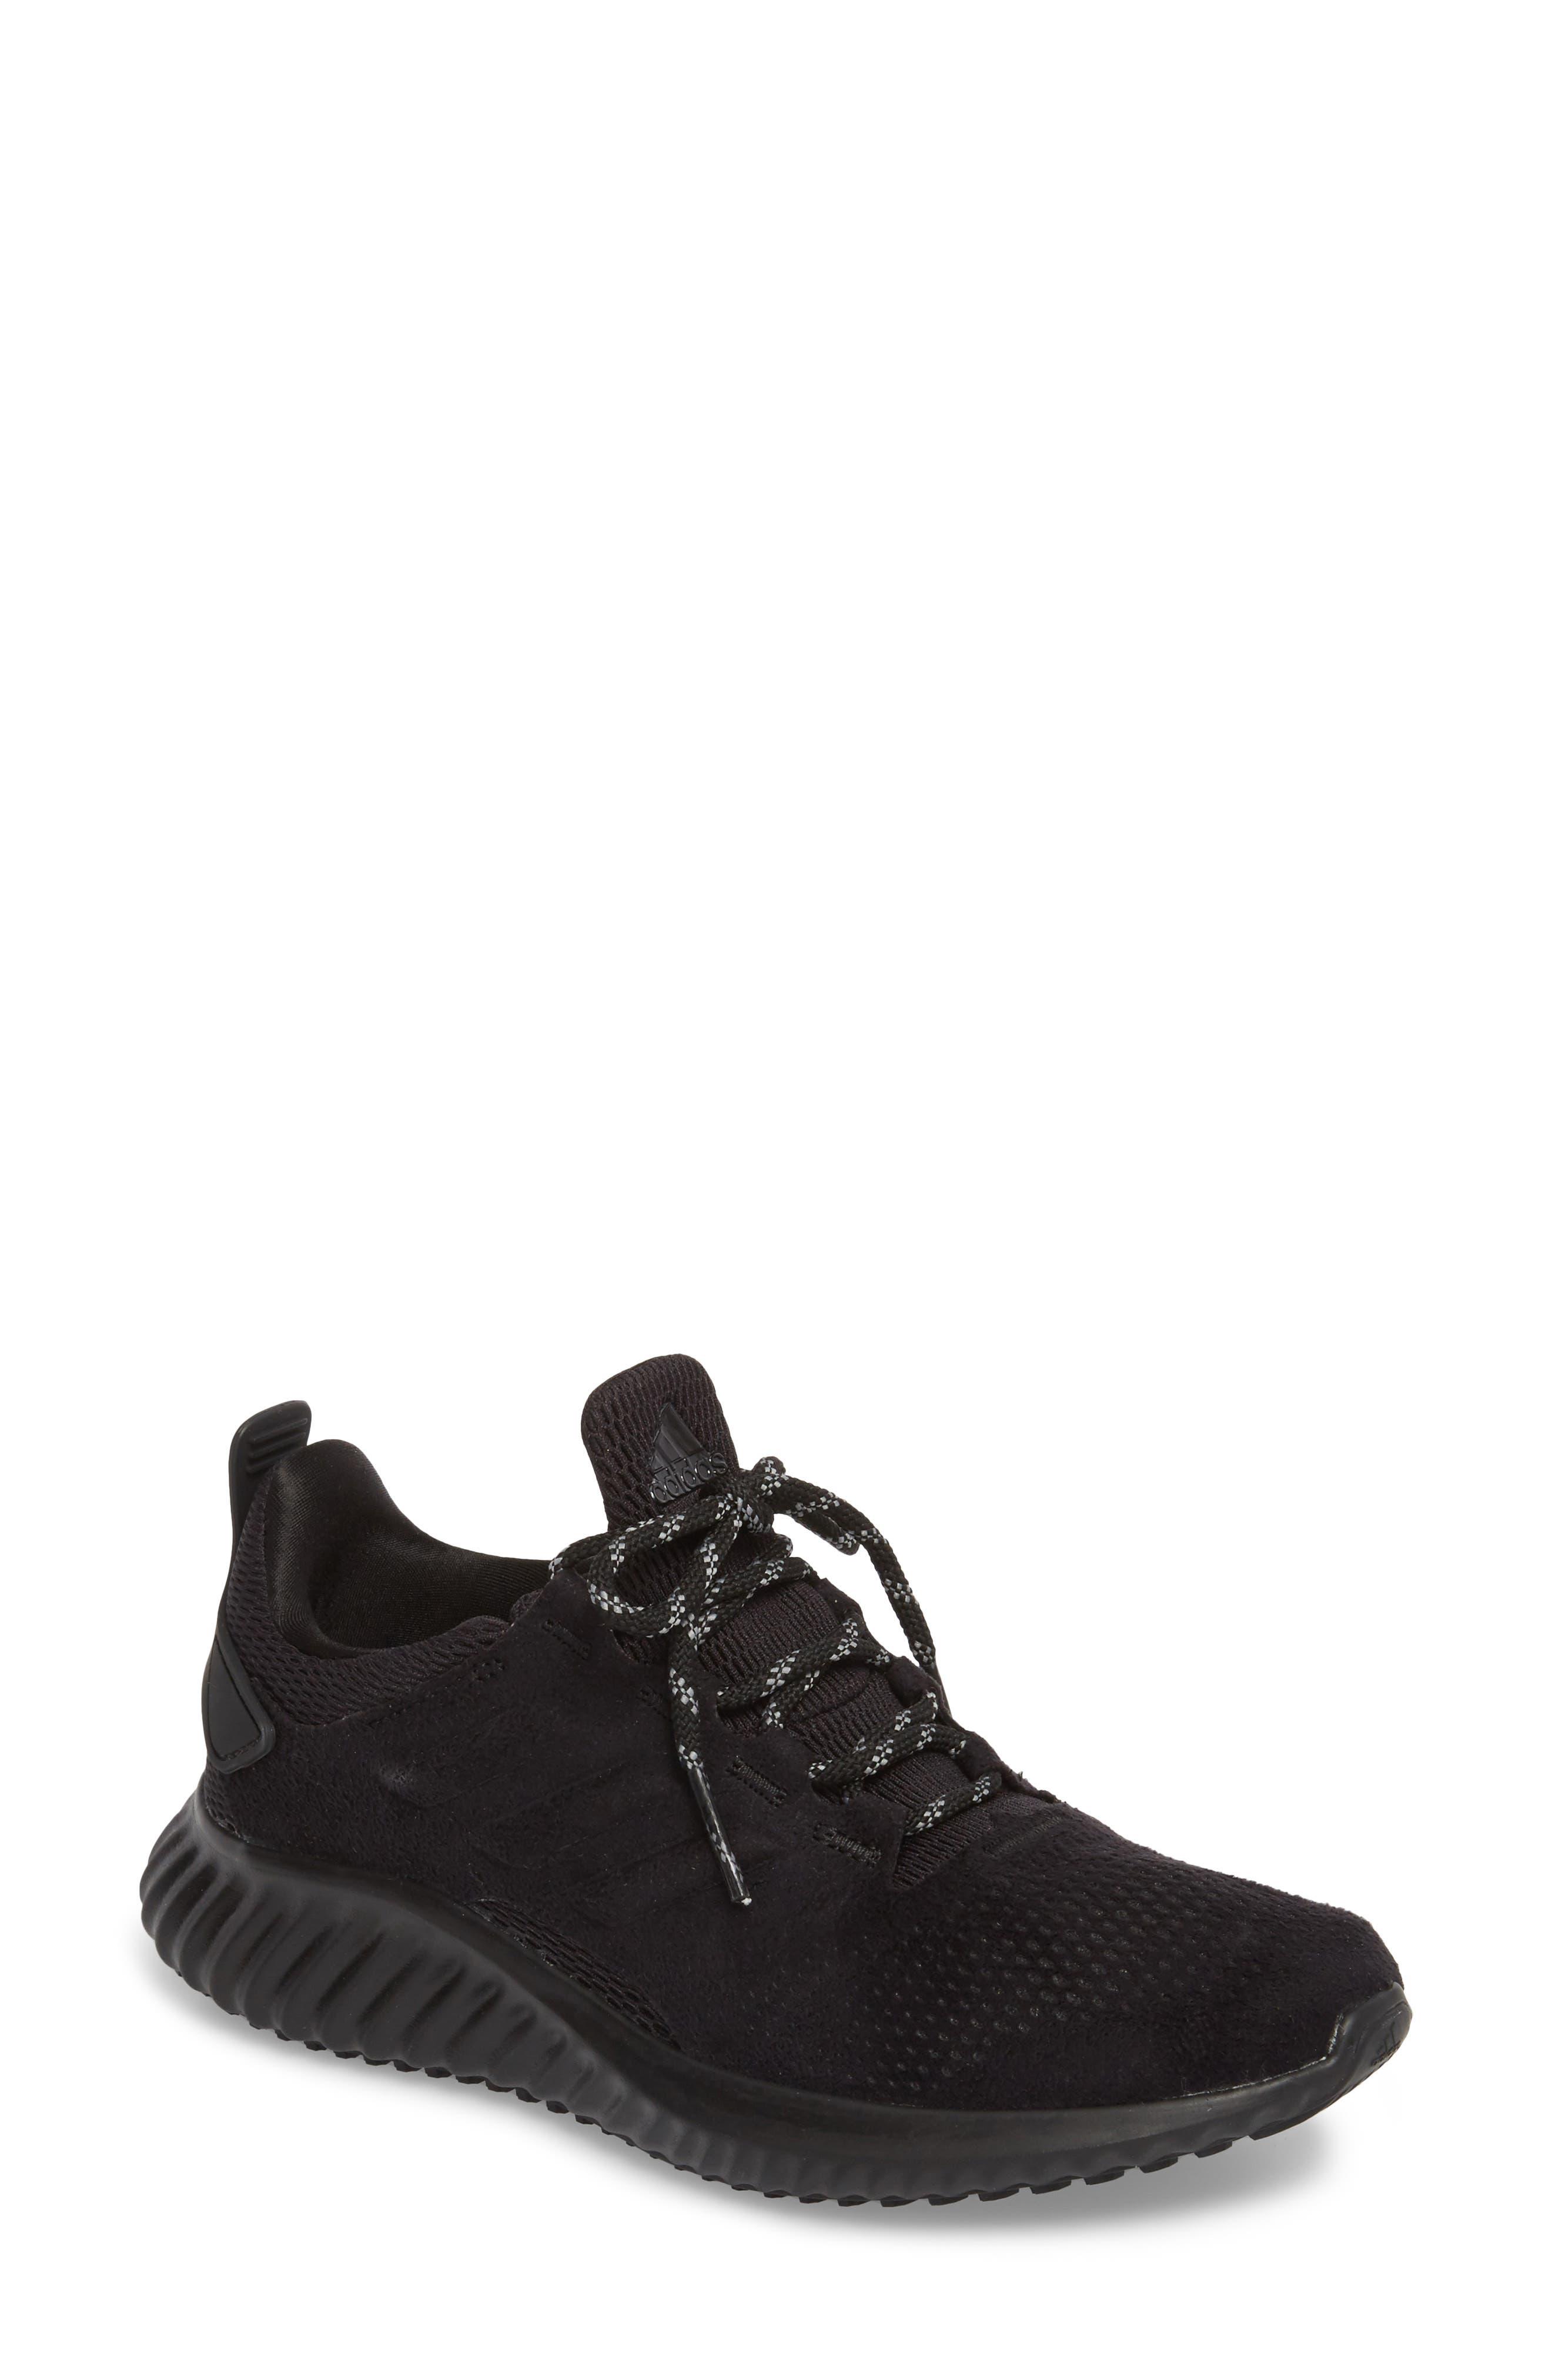 AlphaBounce CR Running Shoe,                             Main thumbnail 1, color,                             CORE BLACK/ CORE BLACK